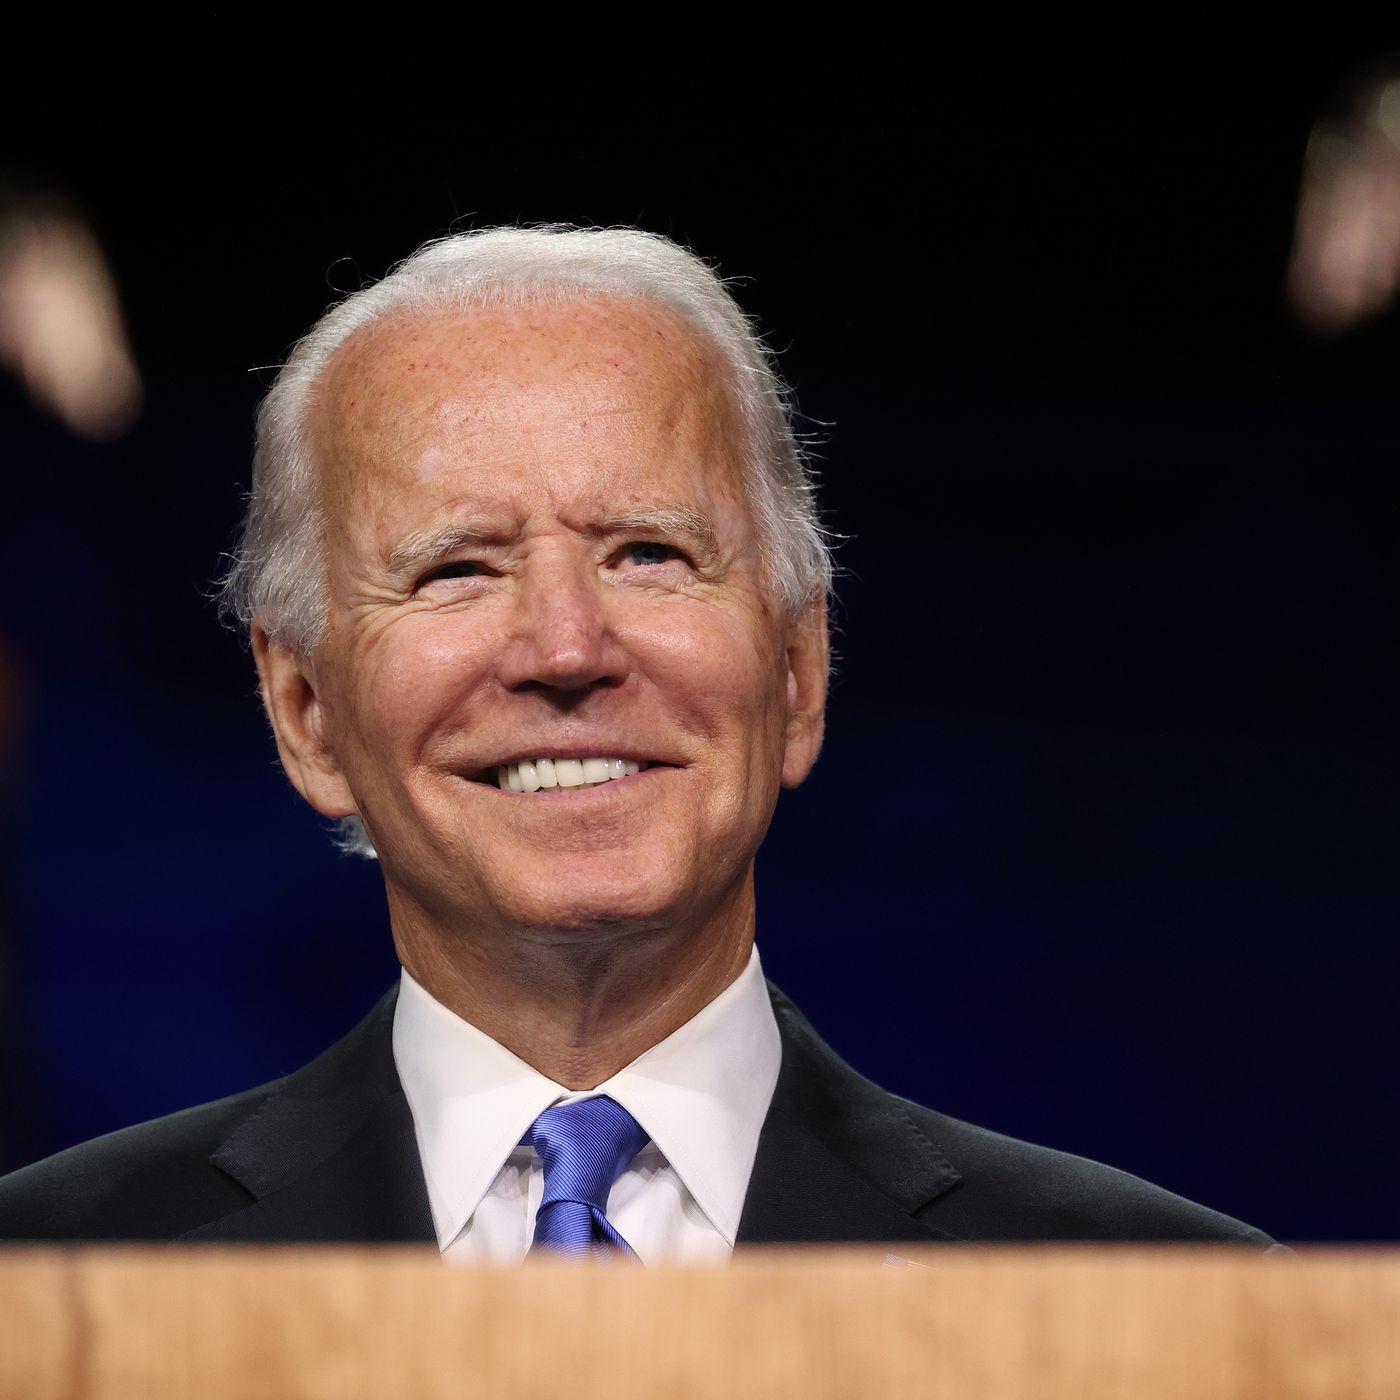 Biden's $1.9 trillion stimulus plan isn't just about stimulus checks